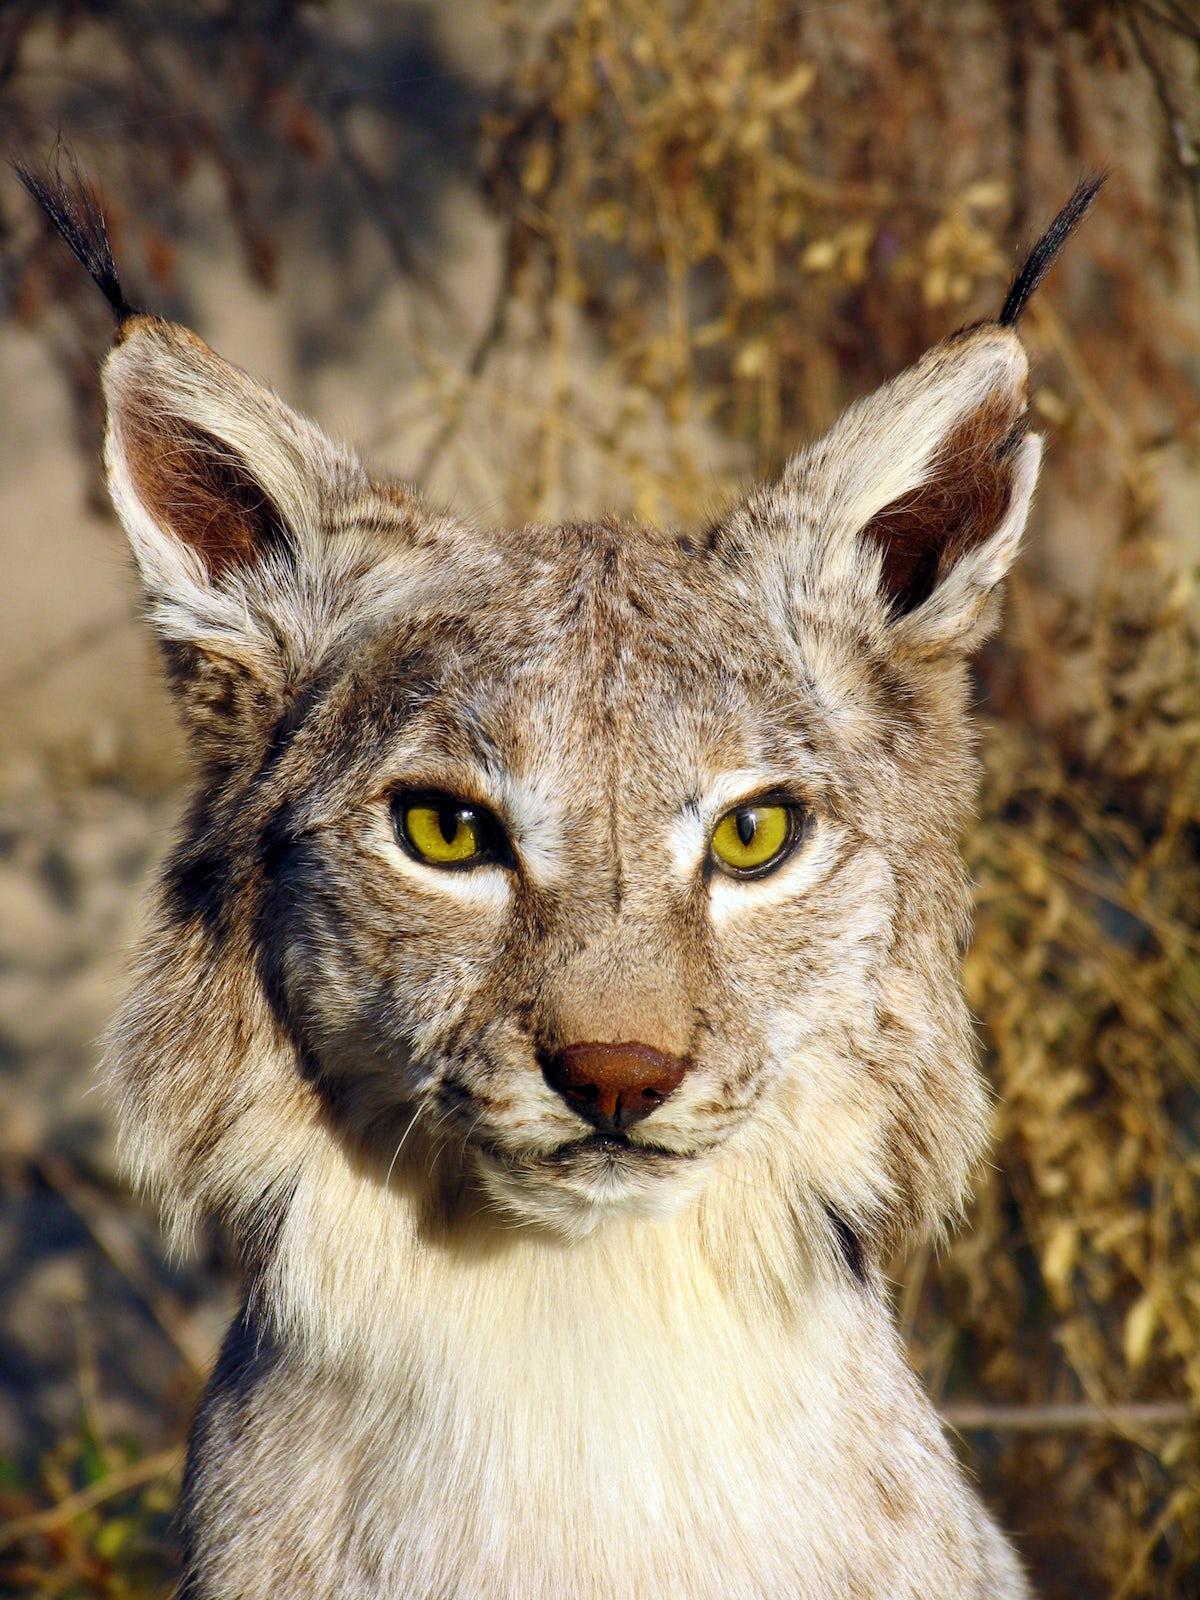 Meet the inhabitants of the Almaty Zoo